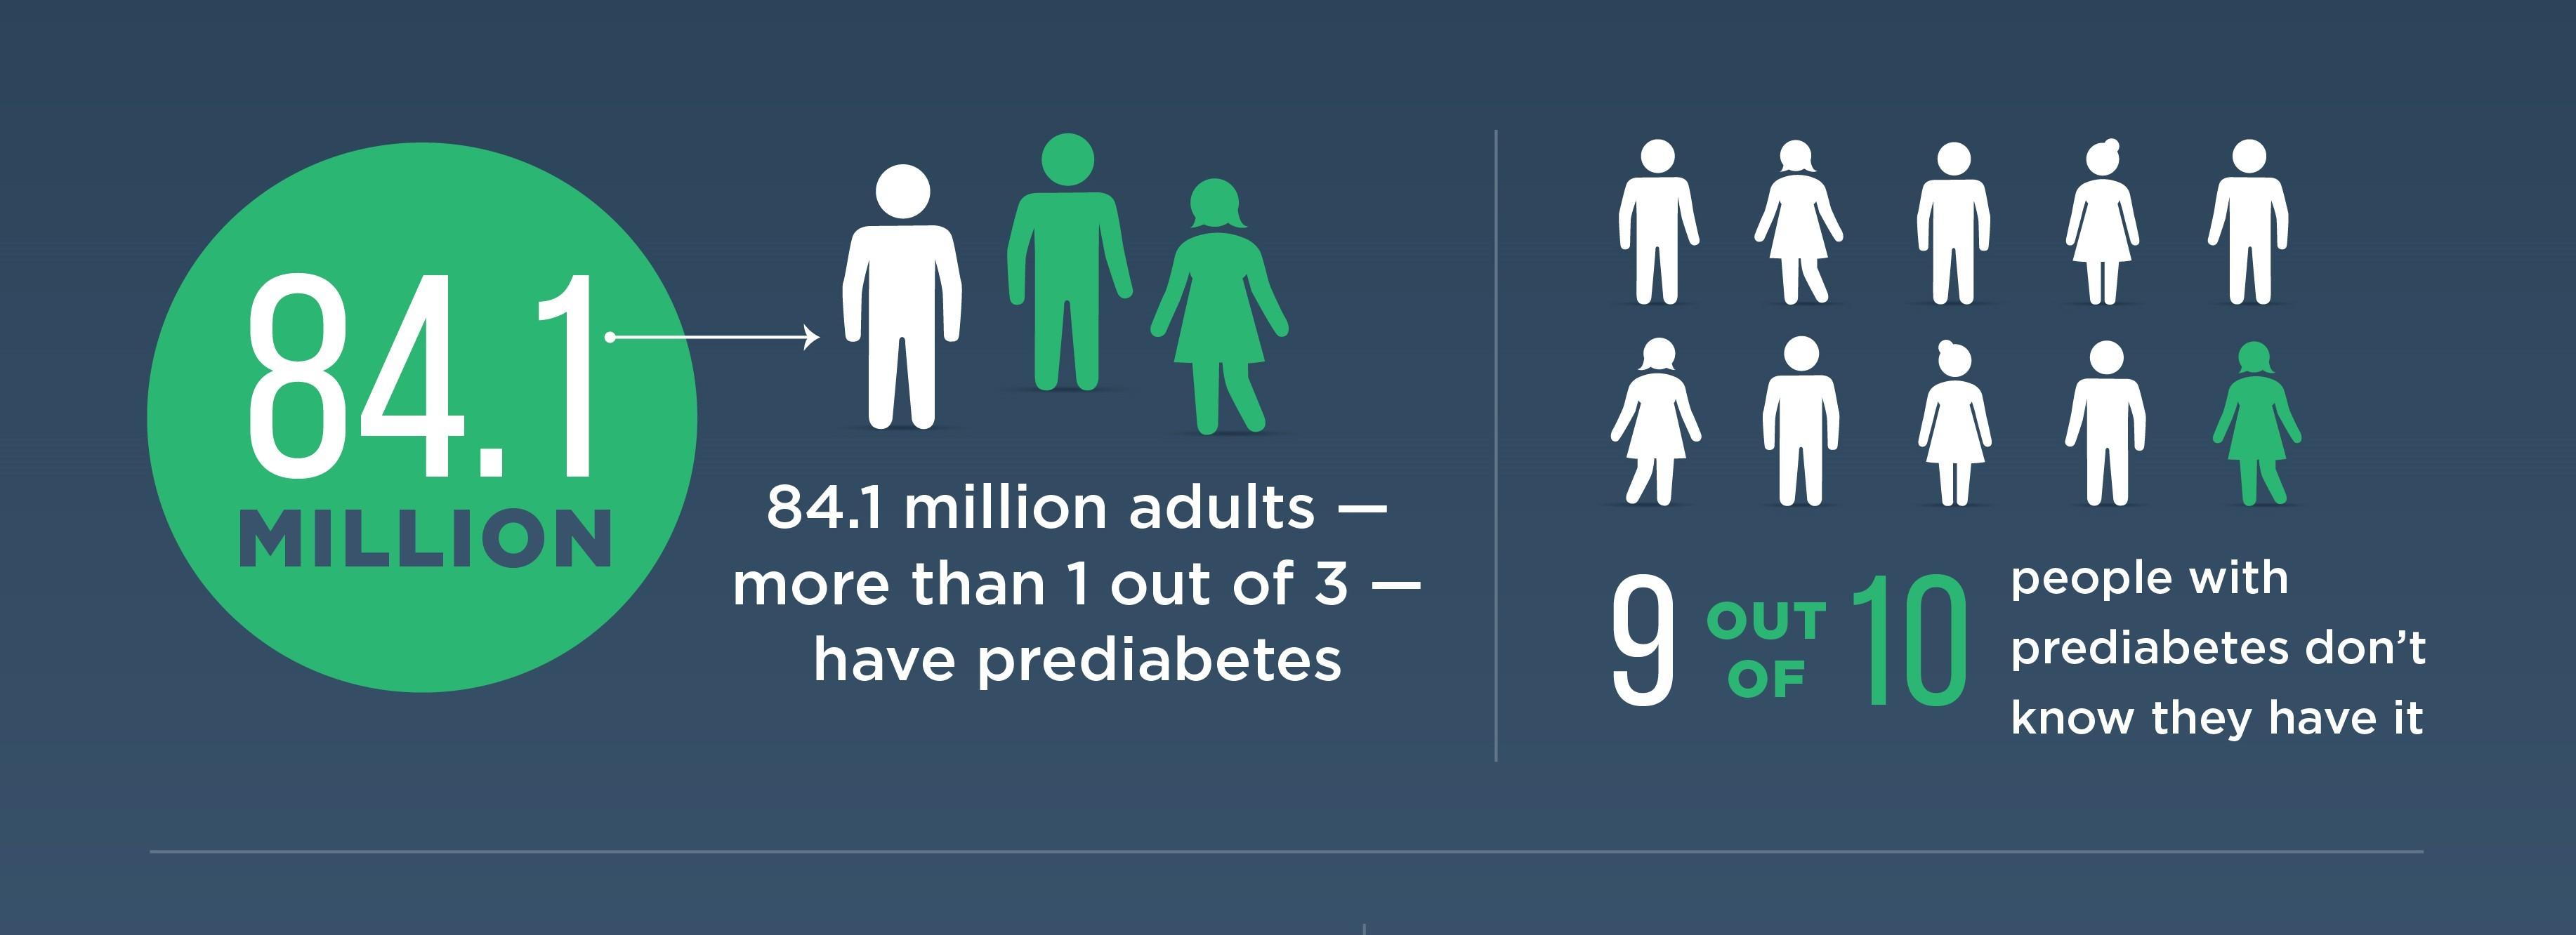 Take the Prediabetes Risk Test